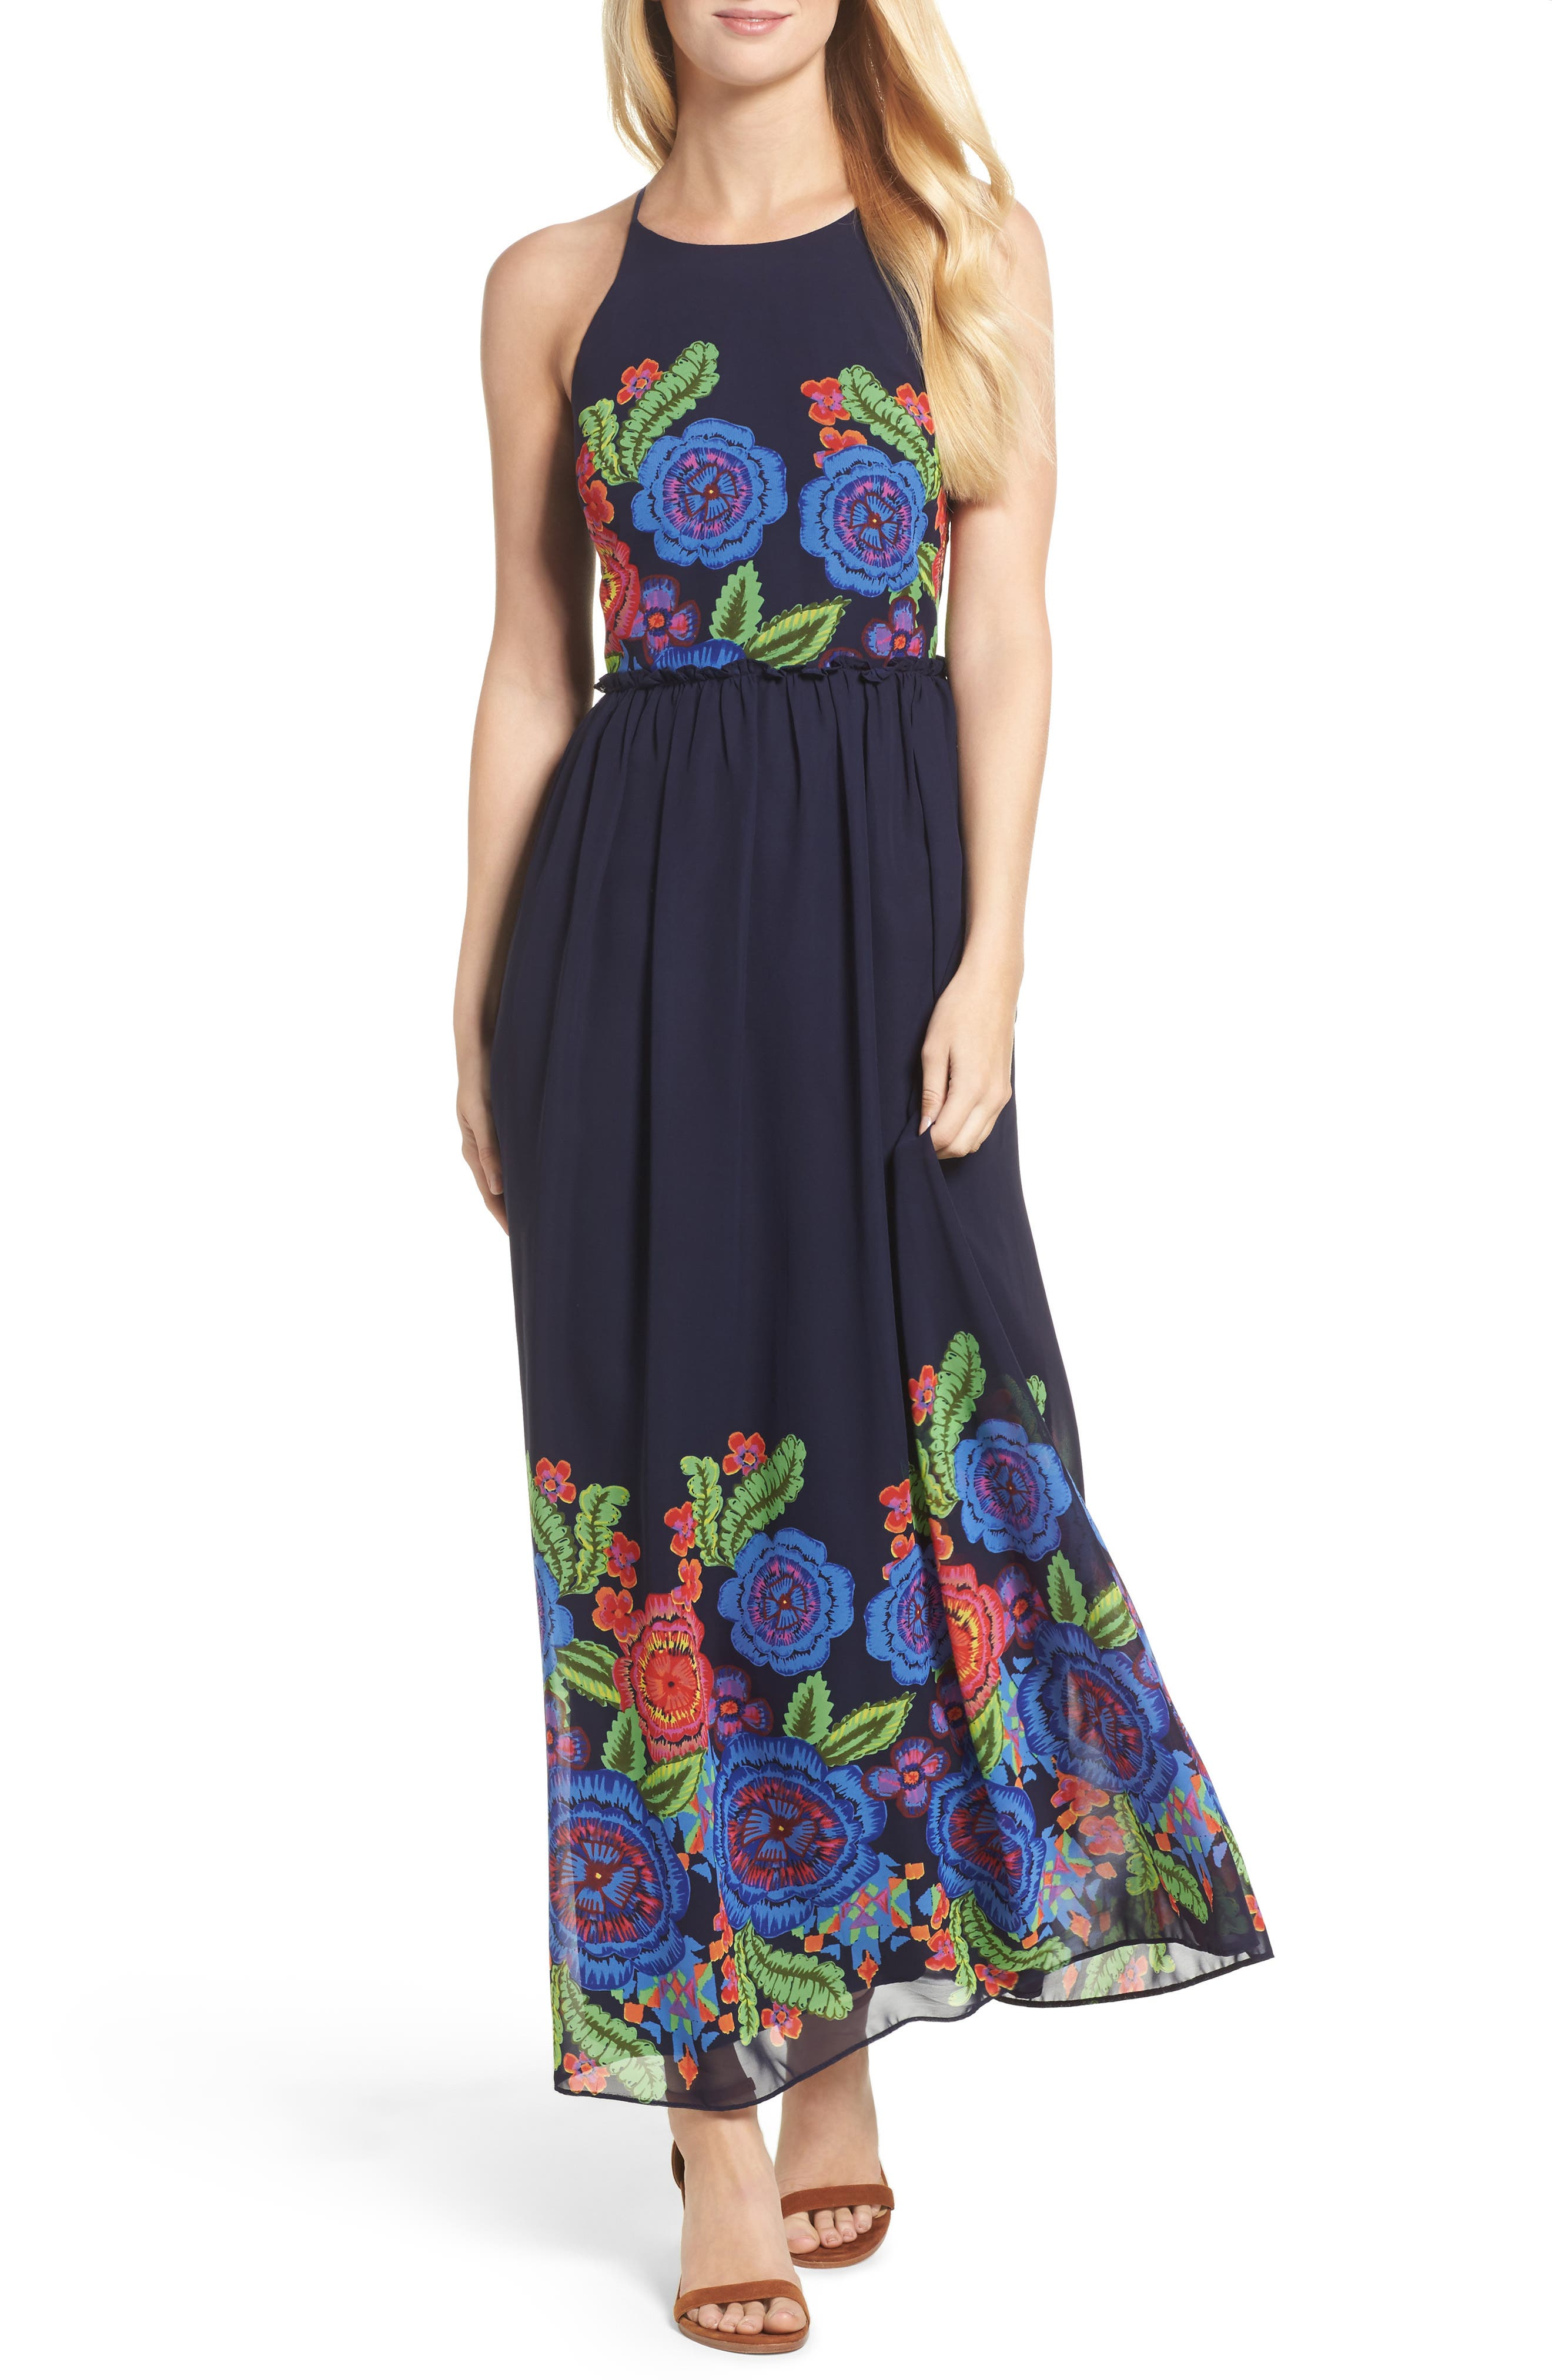 Taylor Dresses Zinnea Maxi Dress